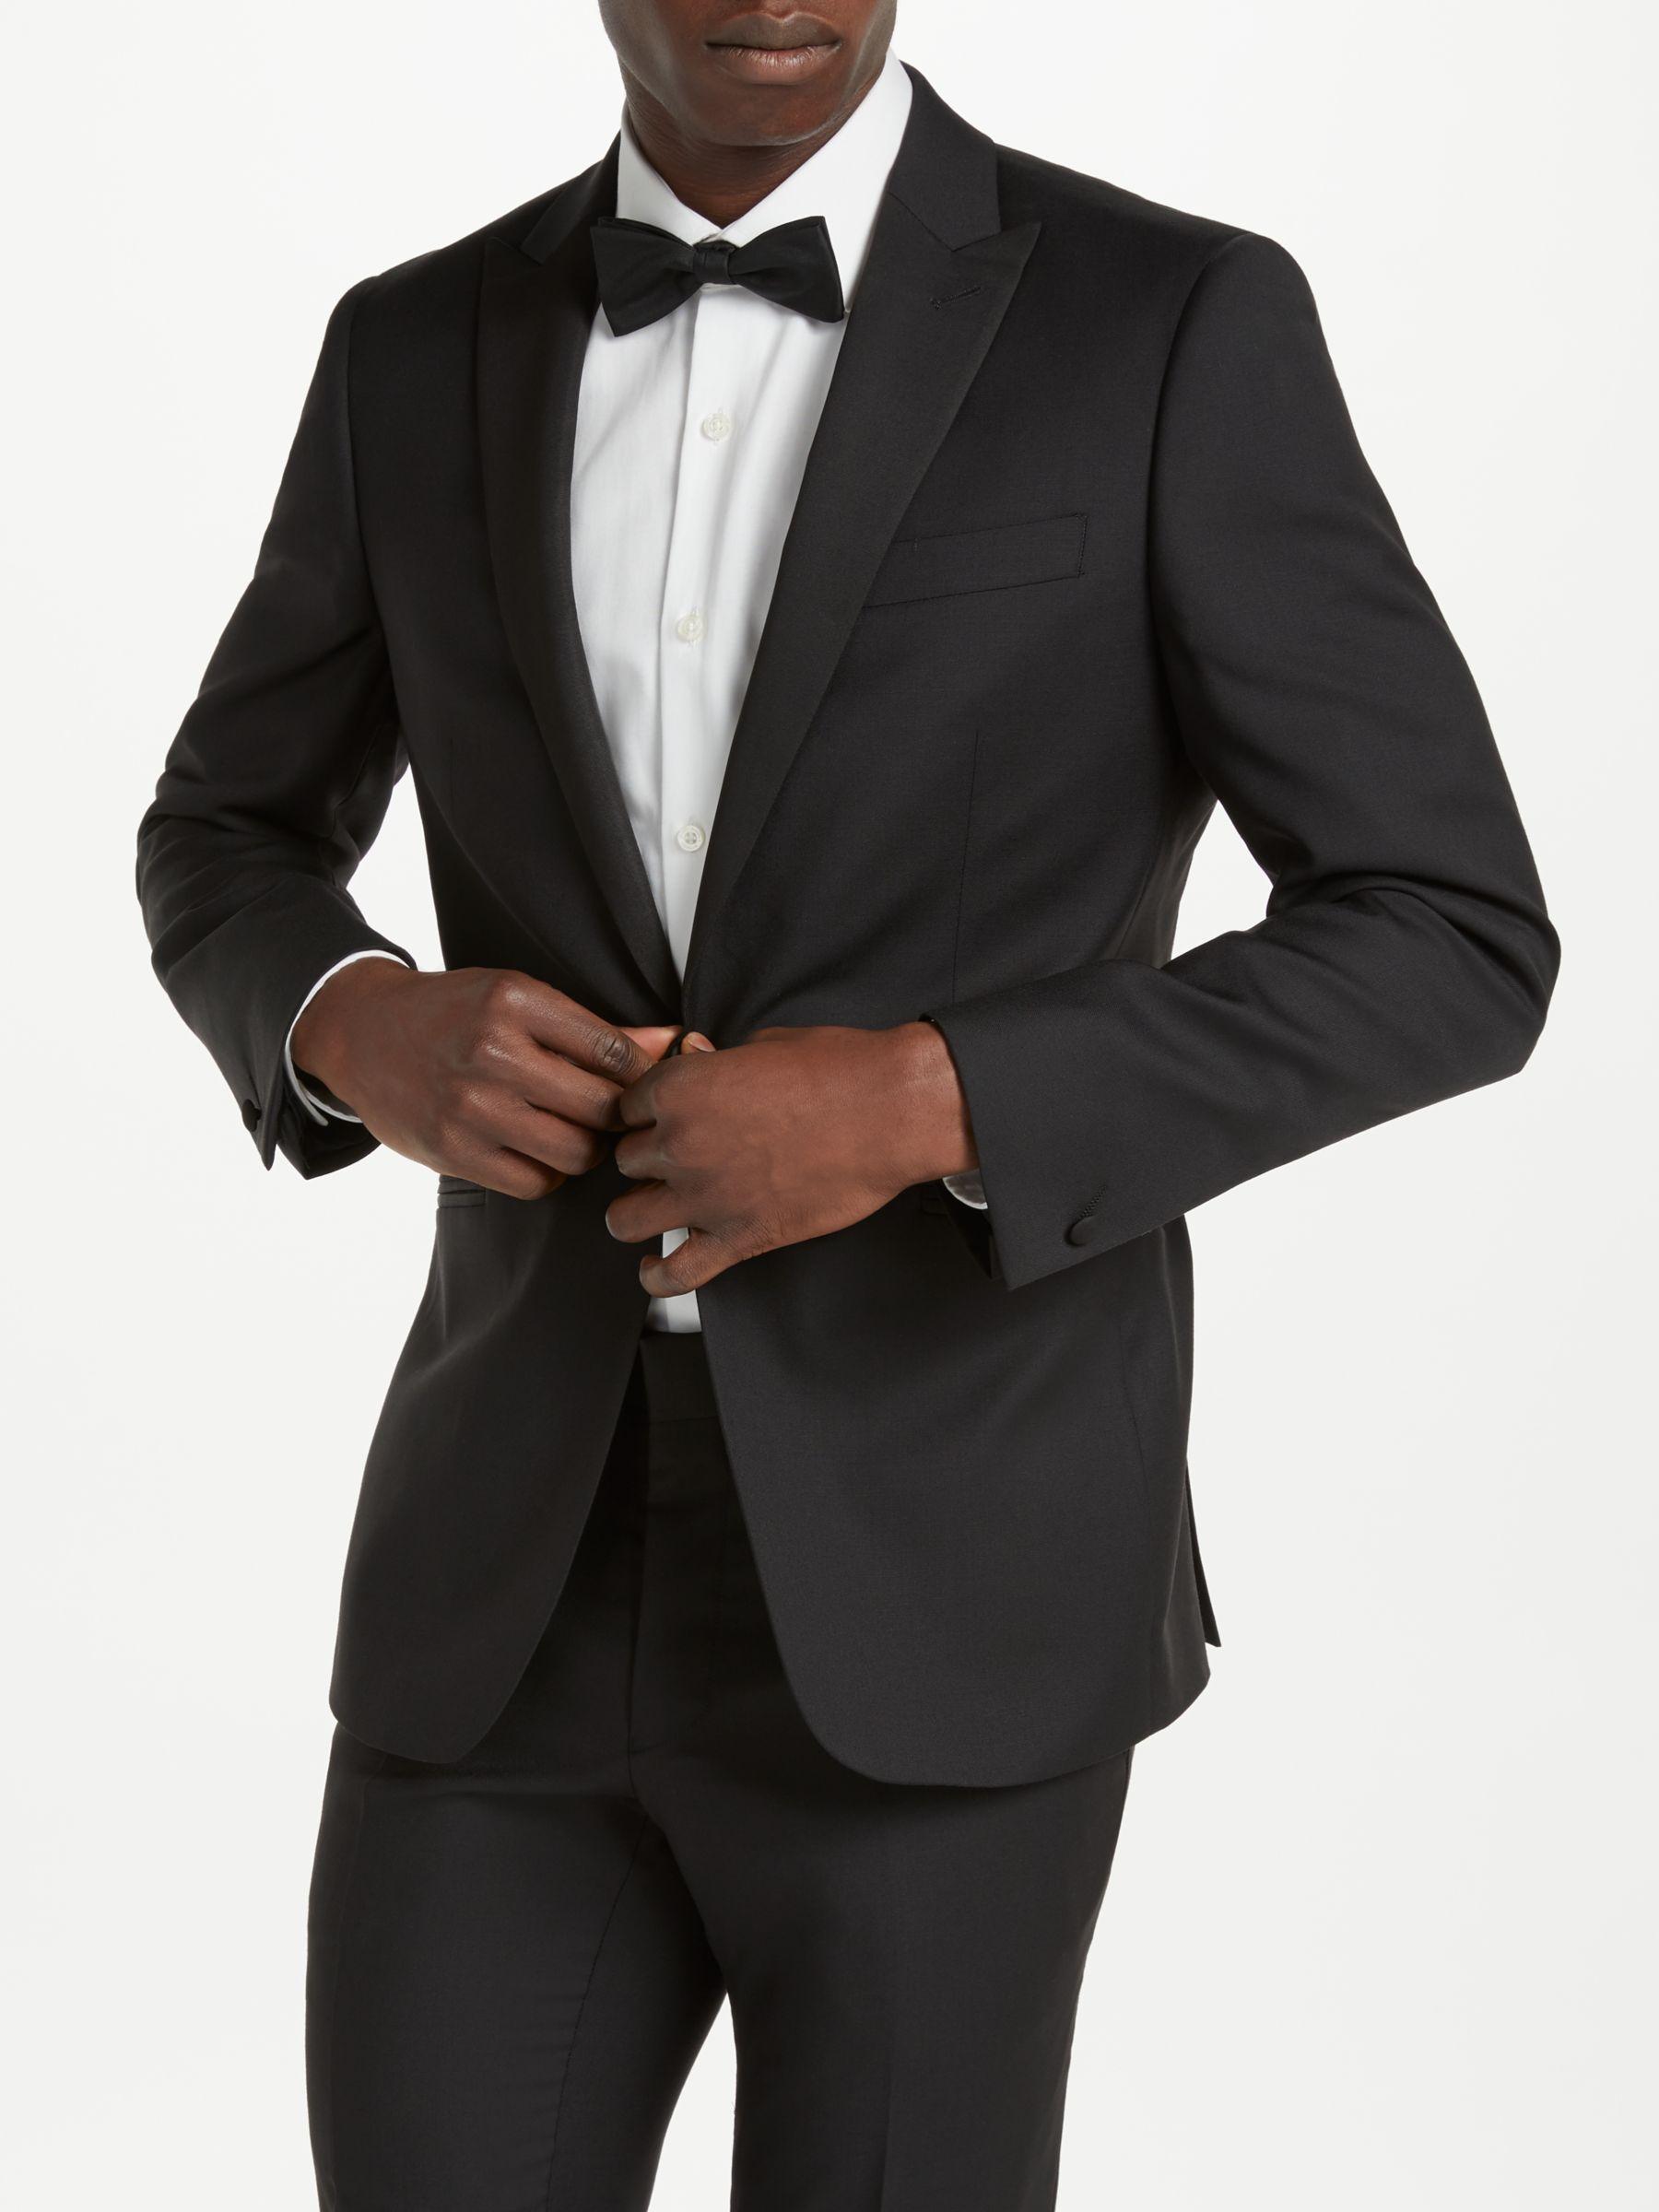 Richard James Mayfair Richard James Mayfair Hopsack Wool Dress Suit Jacket, Black